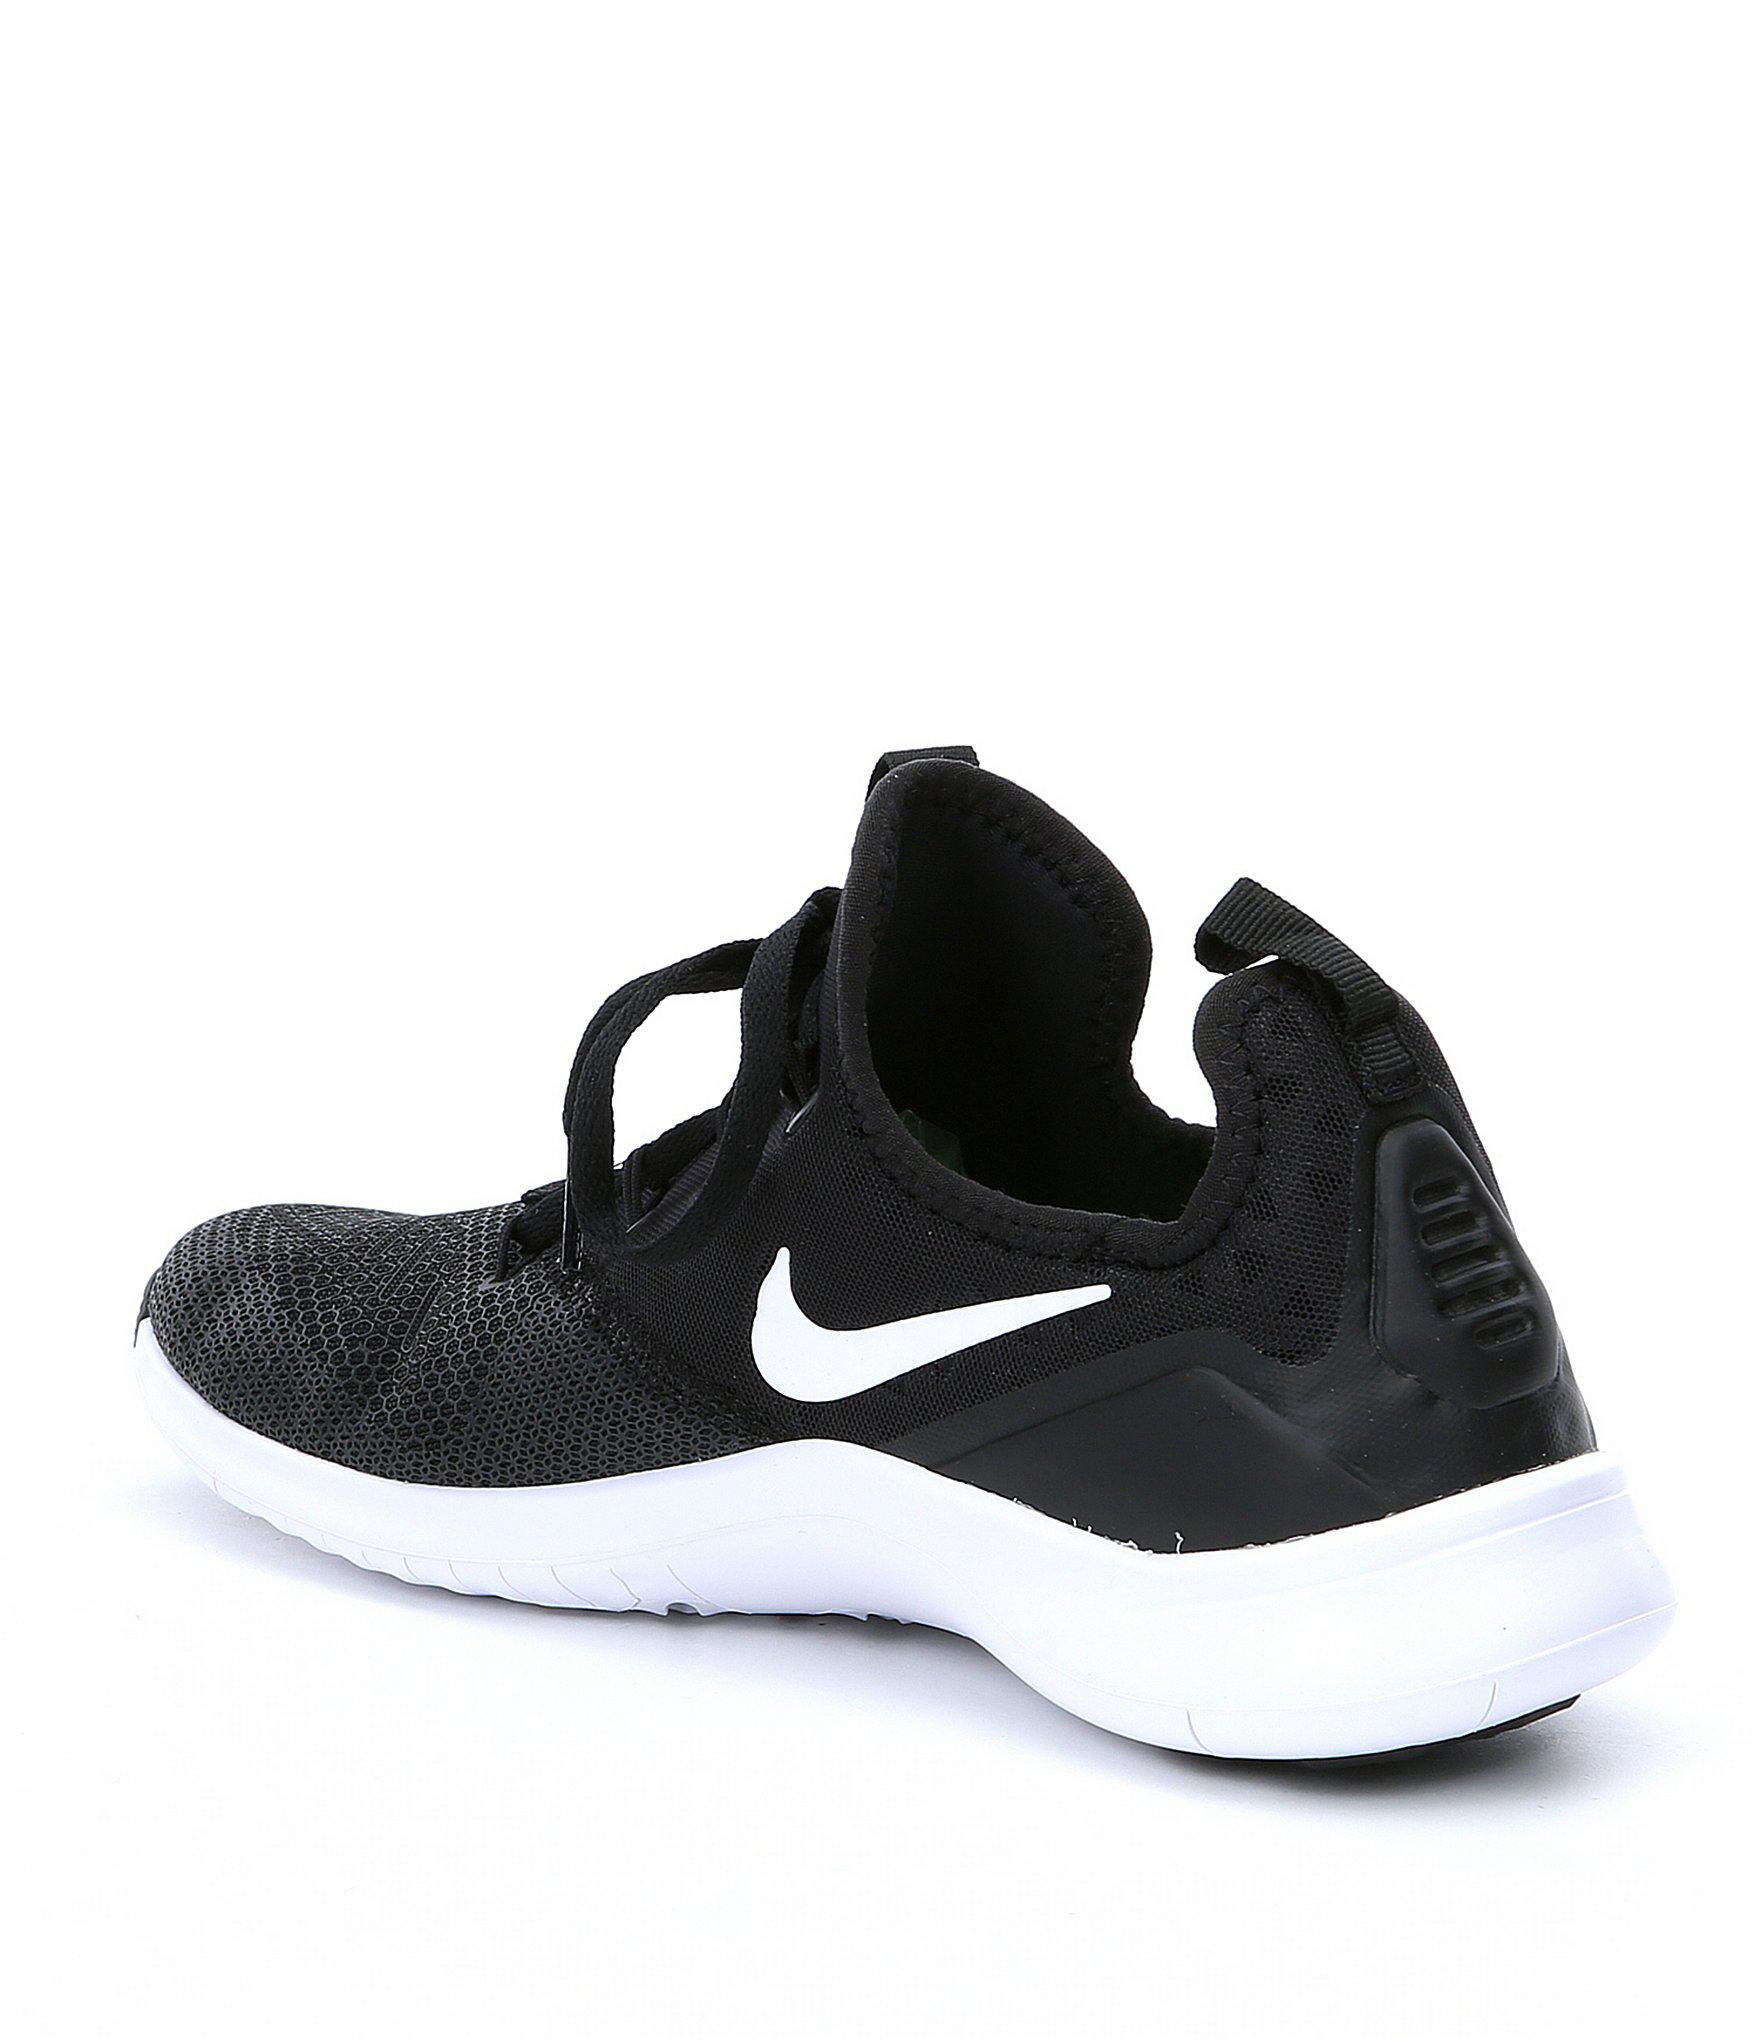 a56dca587f1e ... wholesale nike black womens free tr 8 training shoes lyst. view  fullscreen bbc96 f6b84